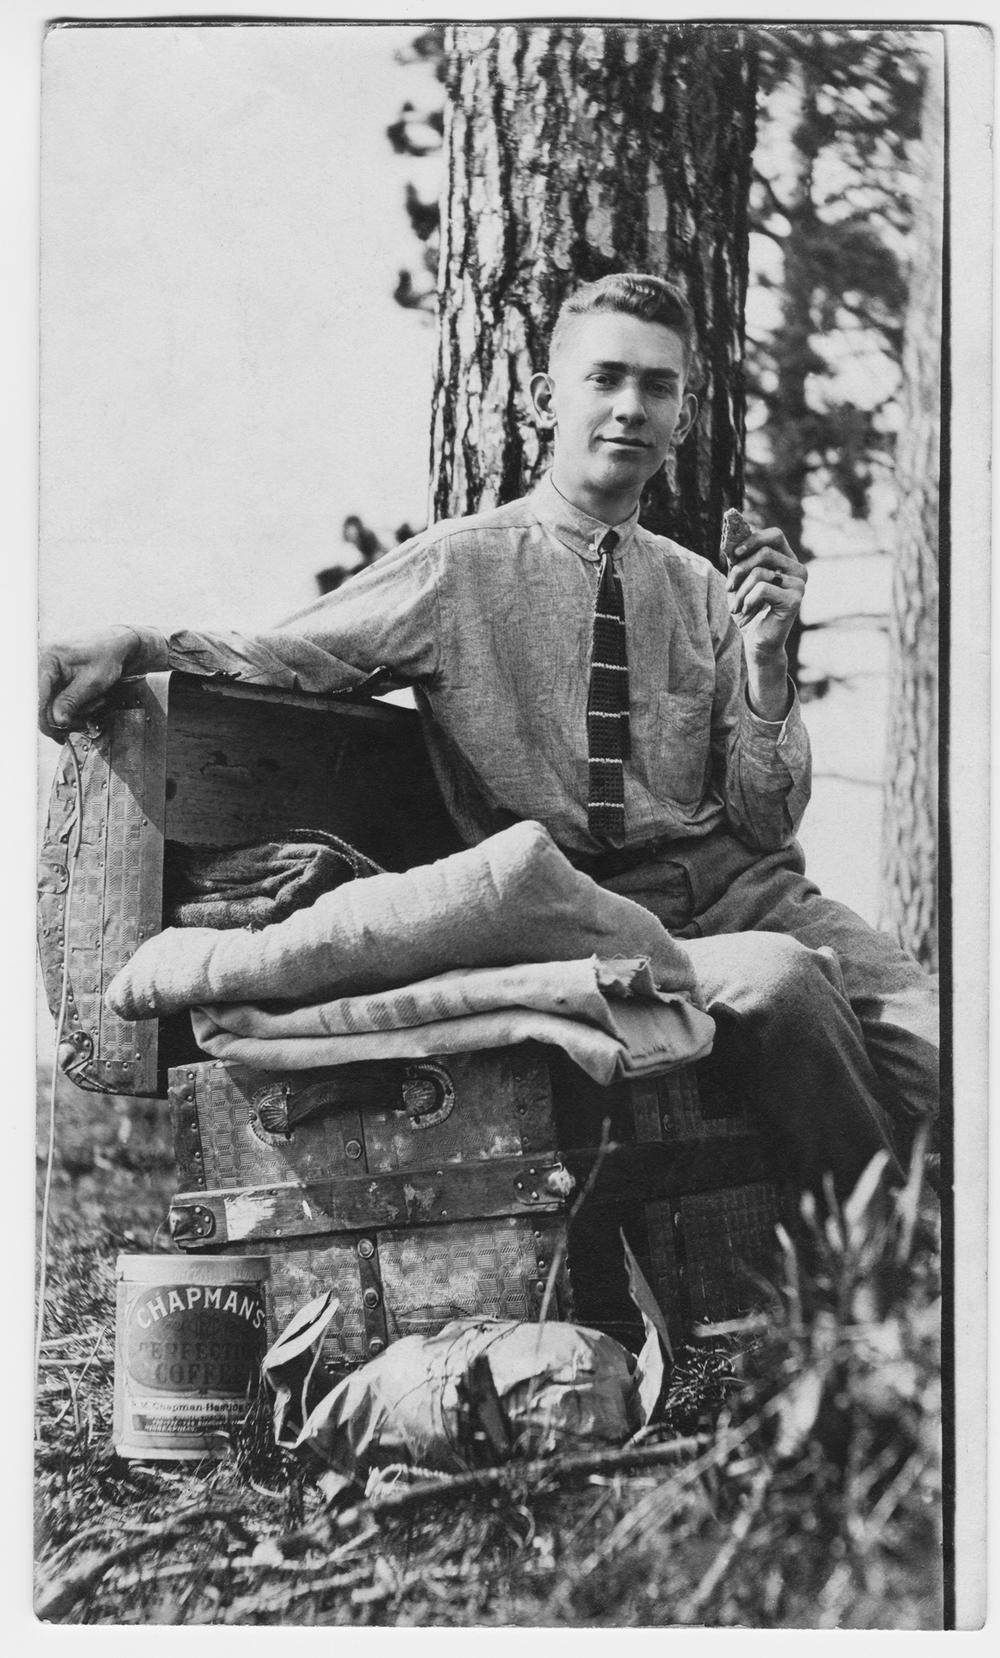 Camp Life, 1916